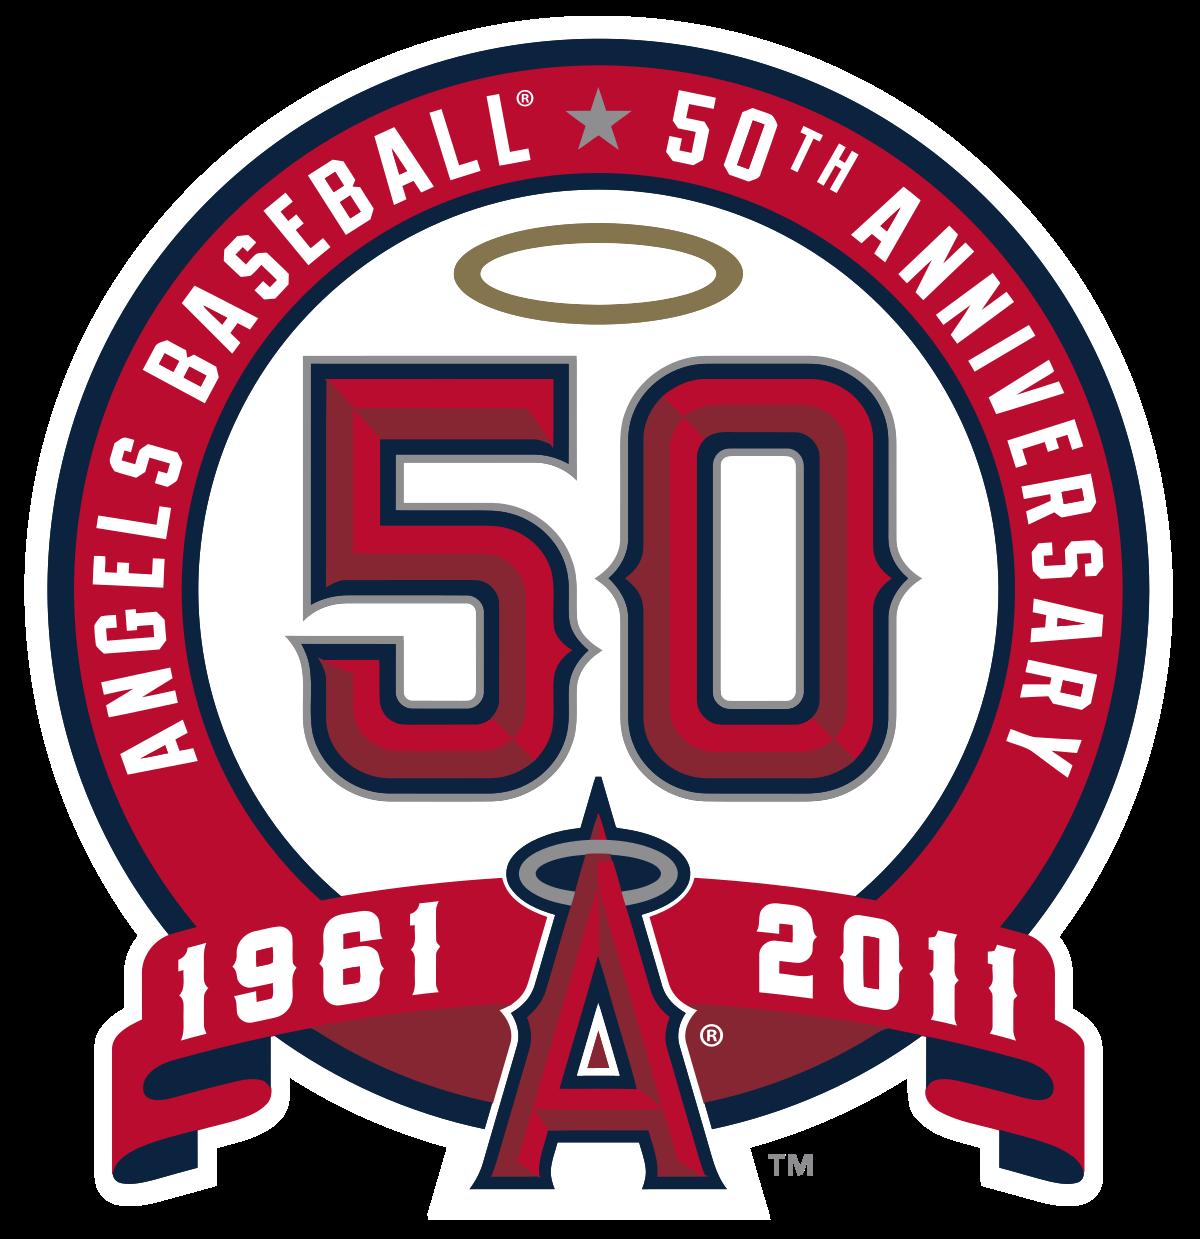 La angels baseball clipart jpg stock 2011 Los Angeles Angels season - Wikipedia jpg stock